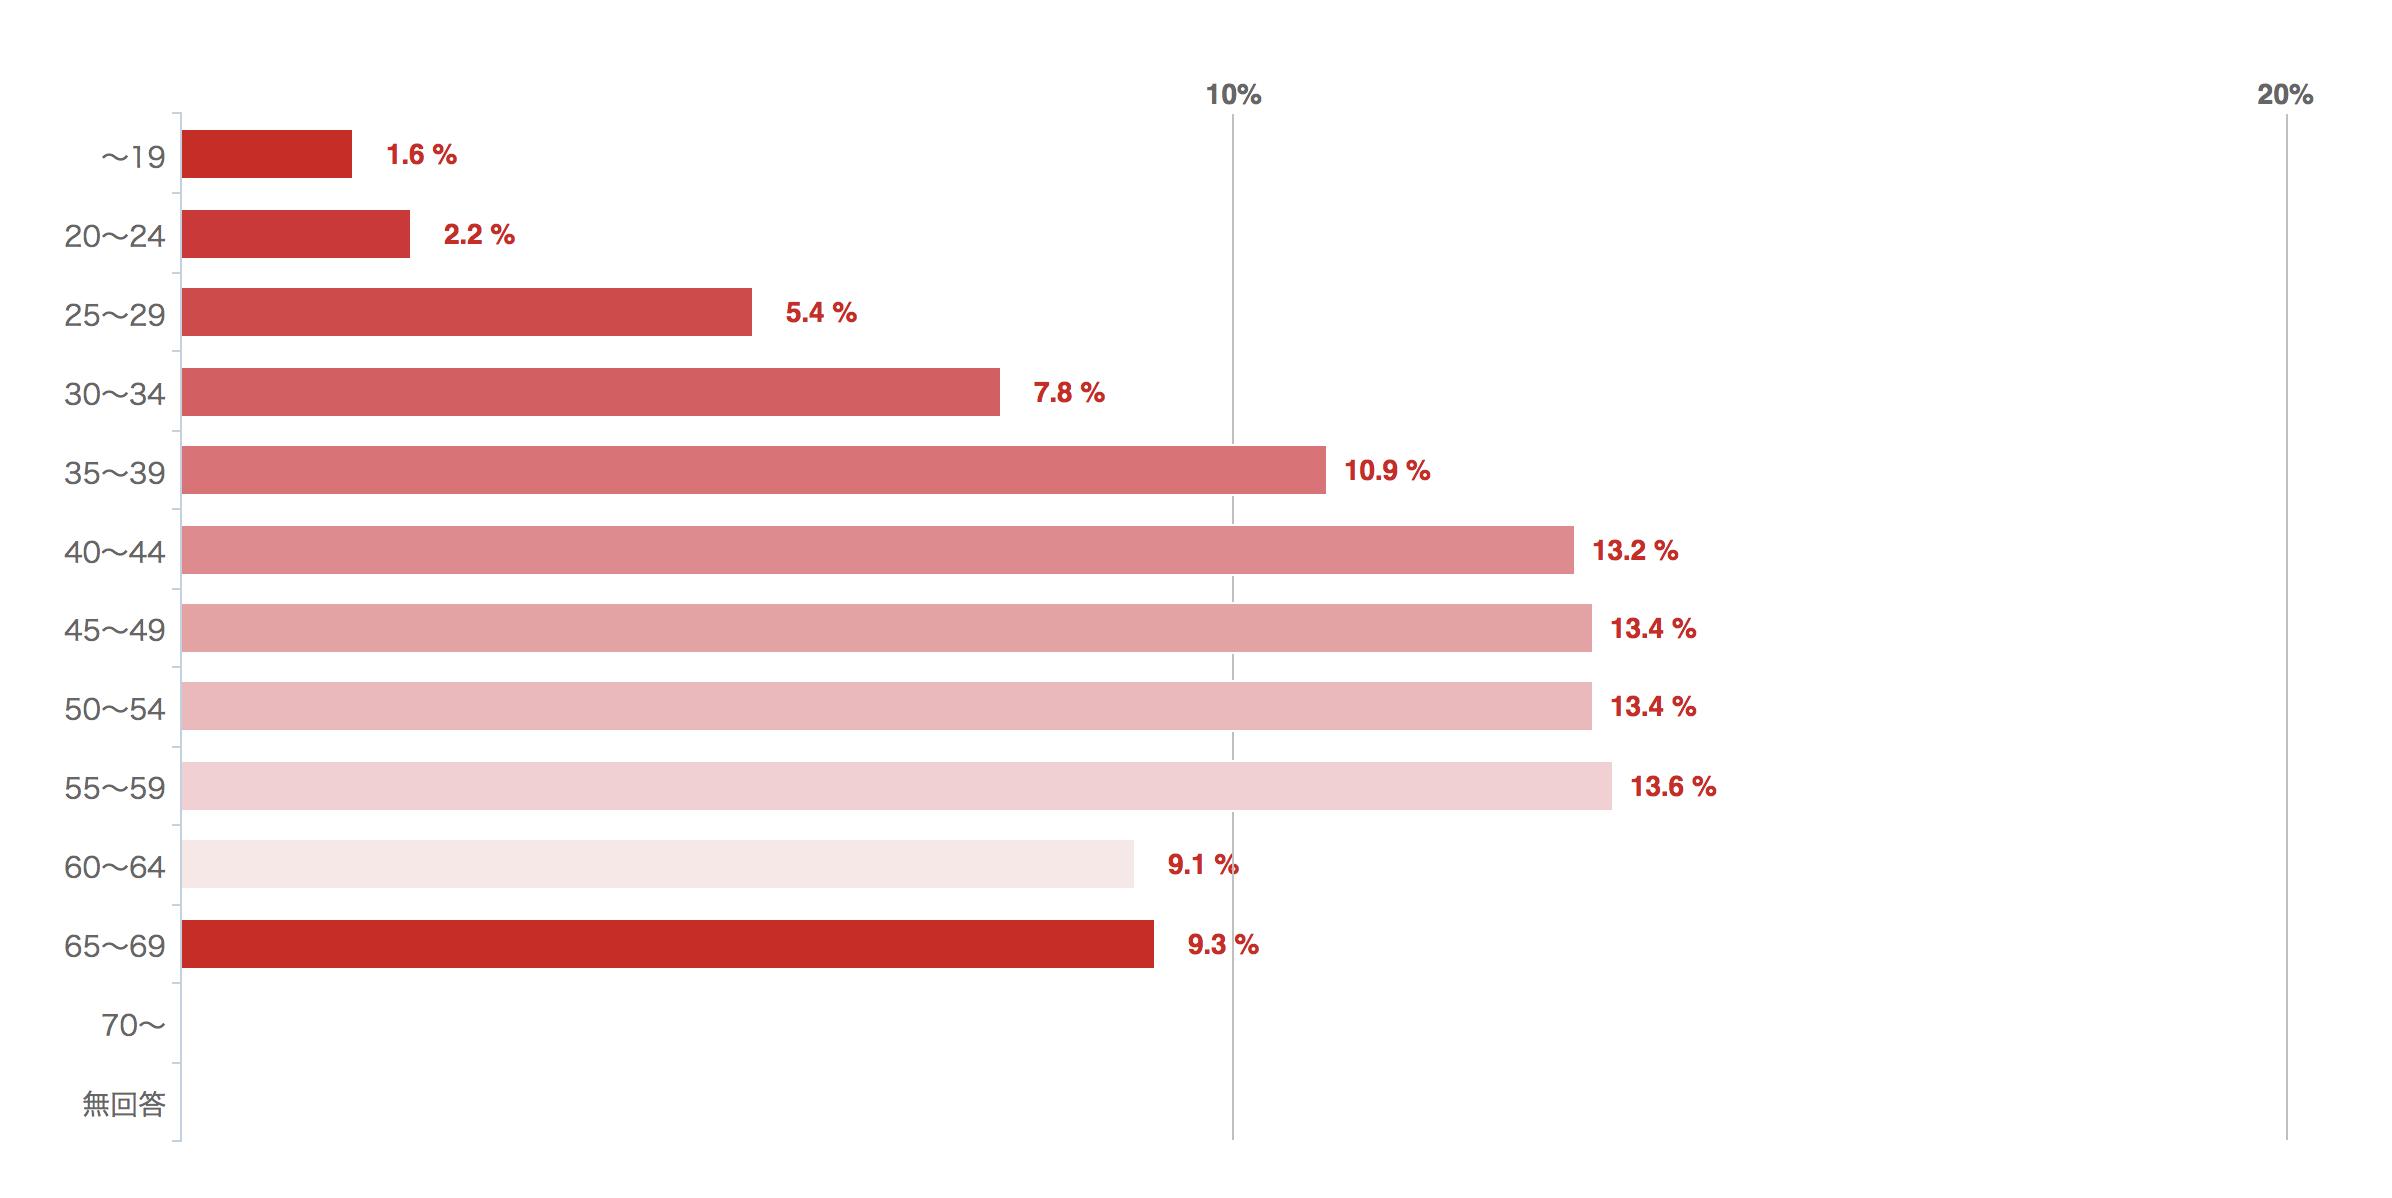 回答者の年齢分布図